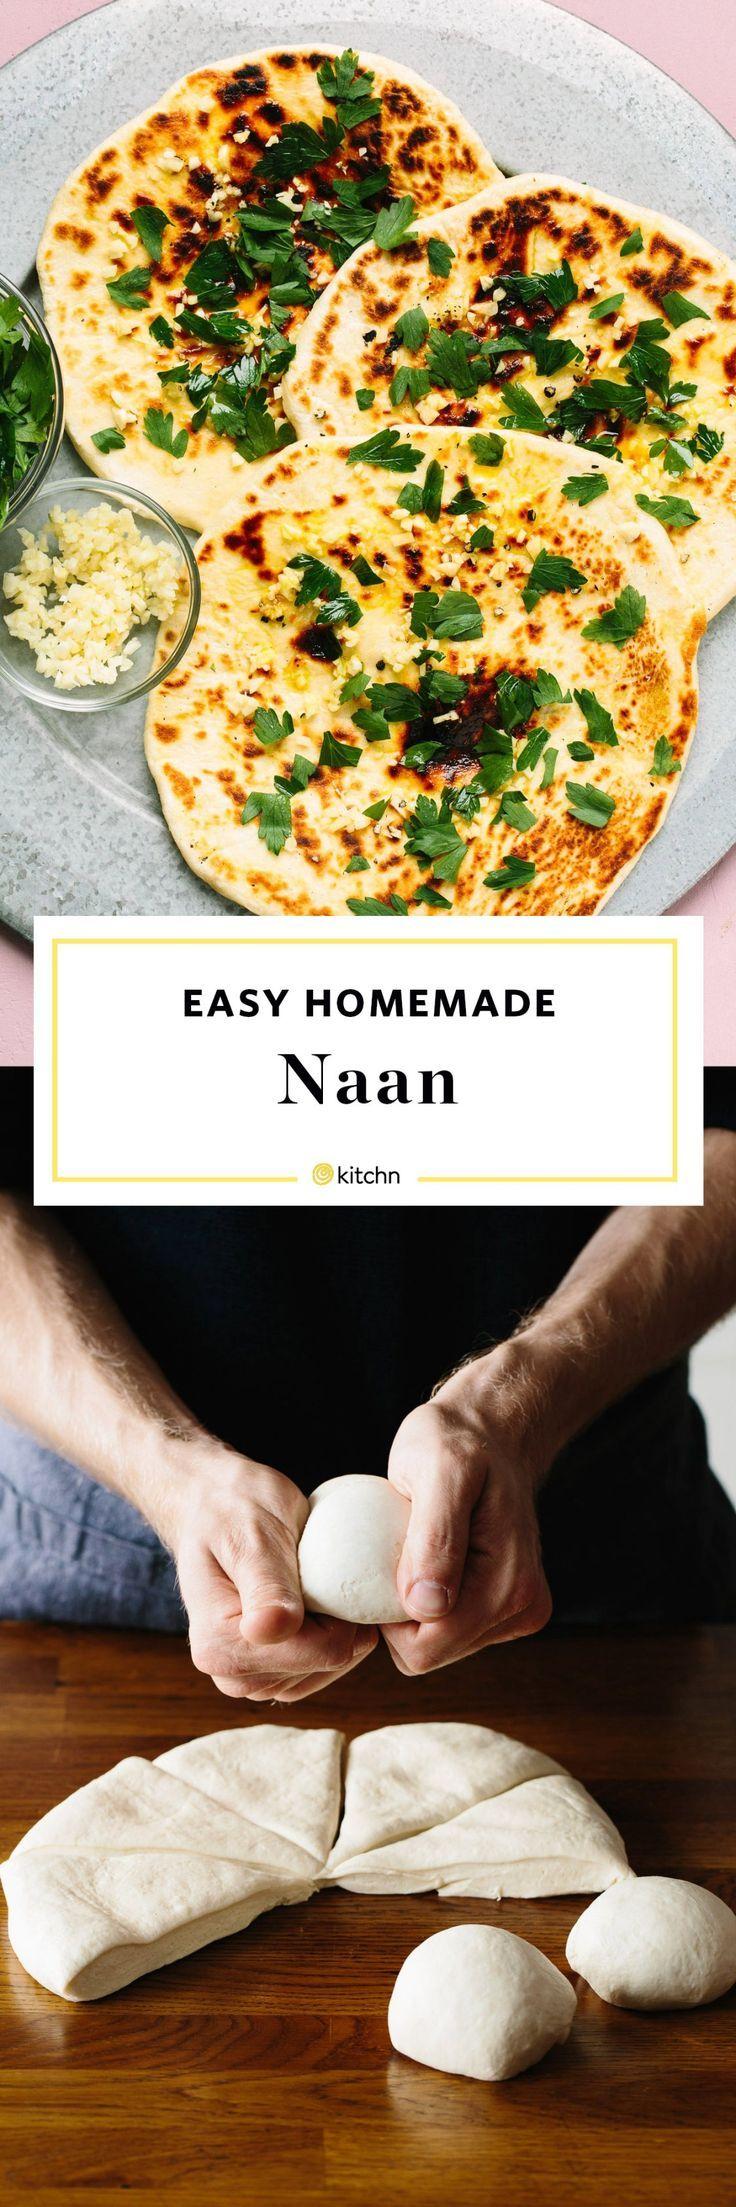 Nann Bread Recipes No Yeast No Yogurt